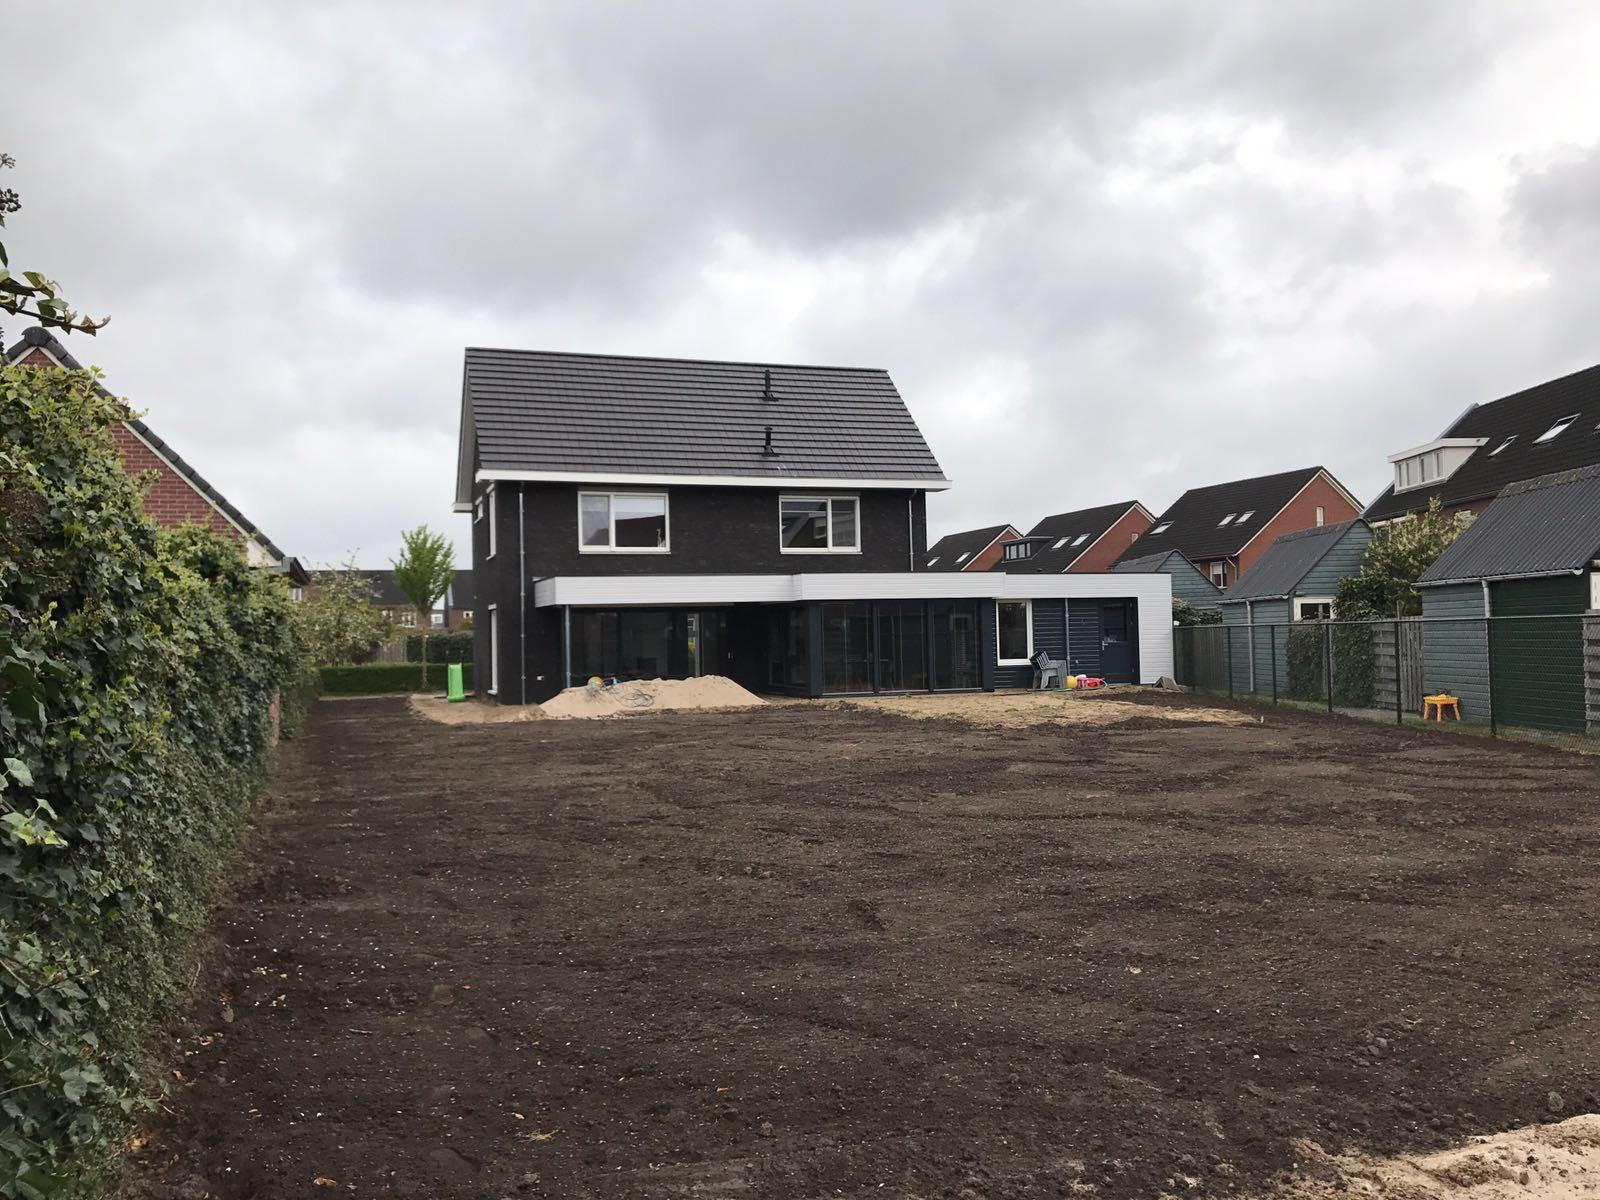 http://uploads.metsander.nl/huis-5-20170727.JPG